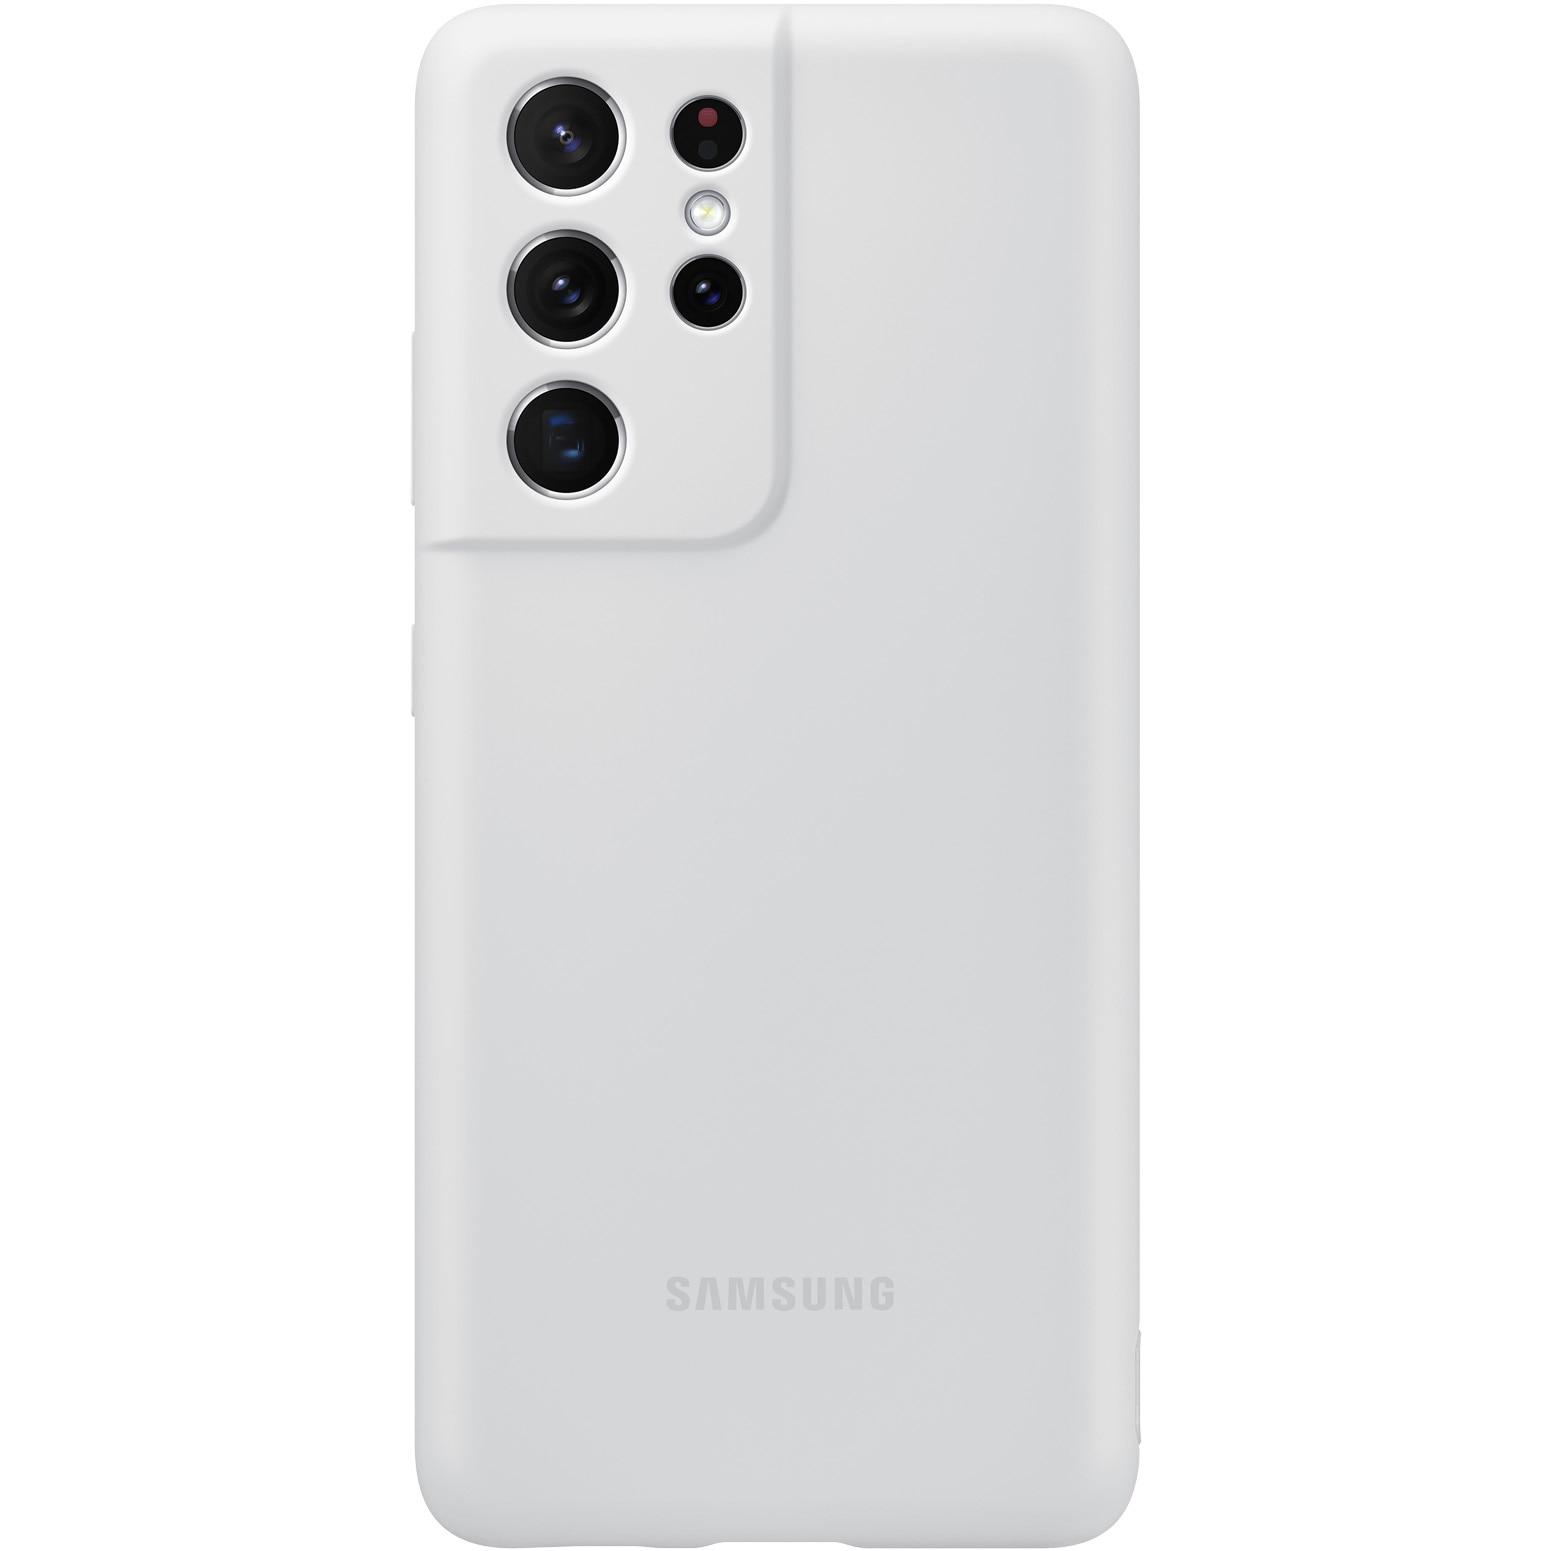 Fotografie Husa de protectie Samsung Silicone Cover pentru Galaxy S21 Ultra, Light Gray